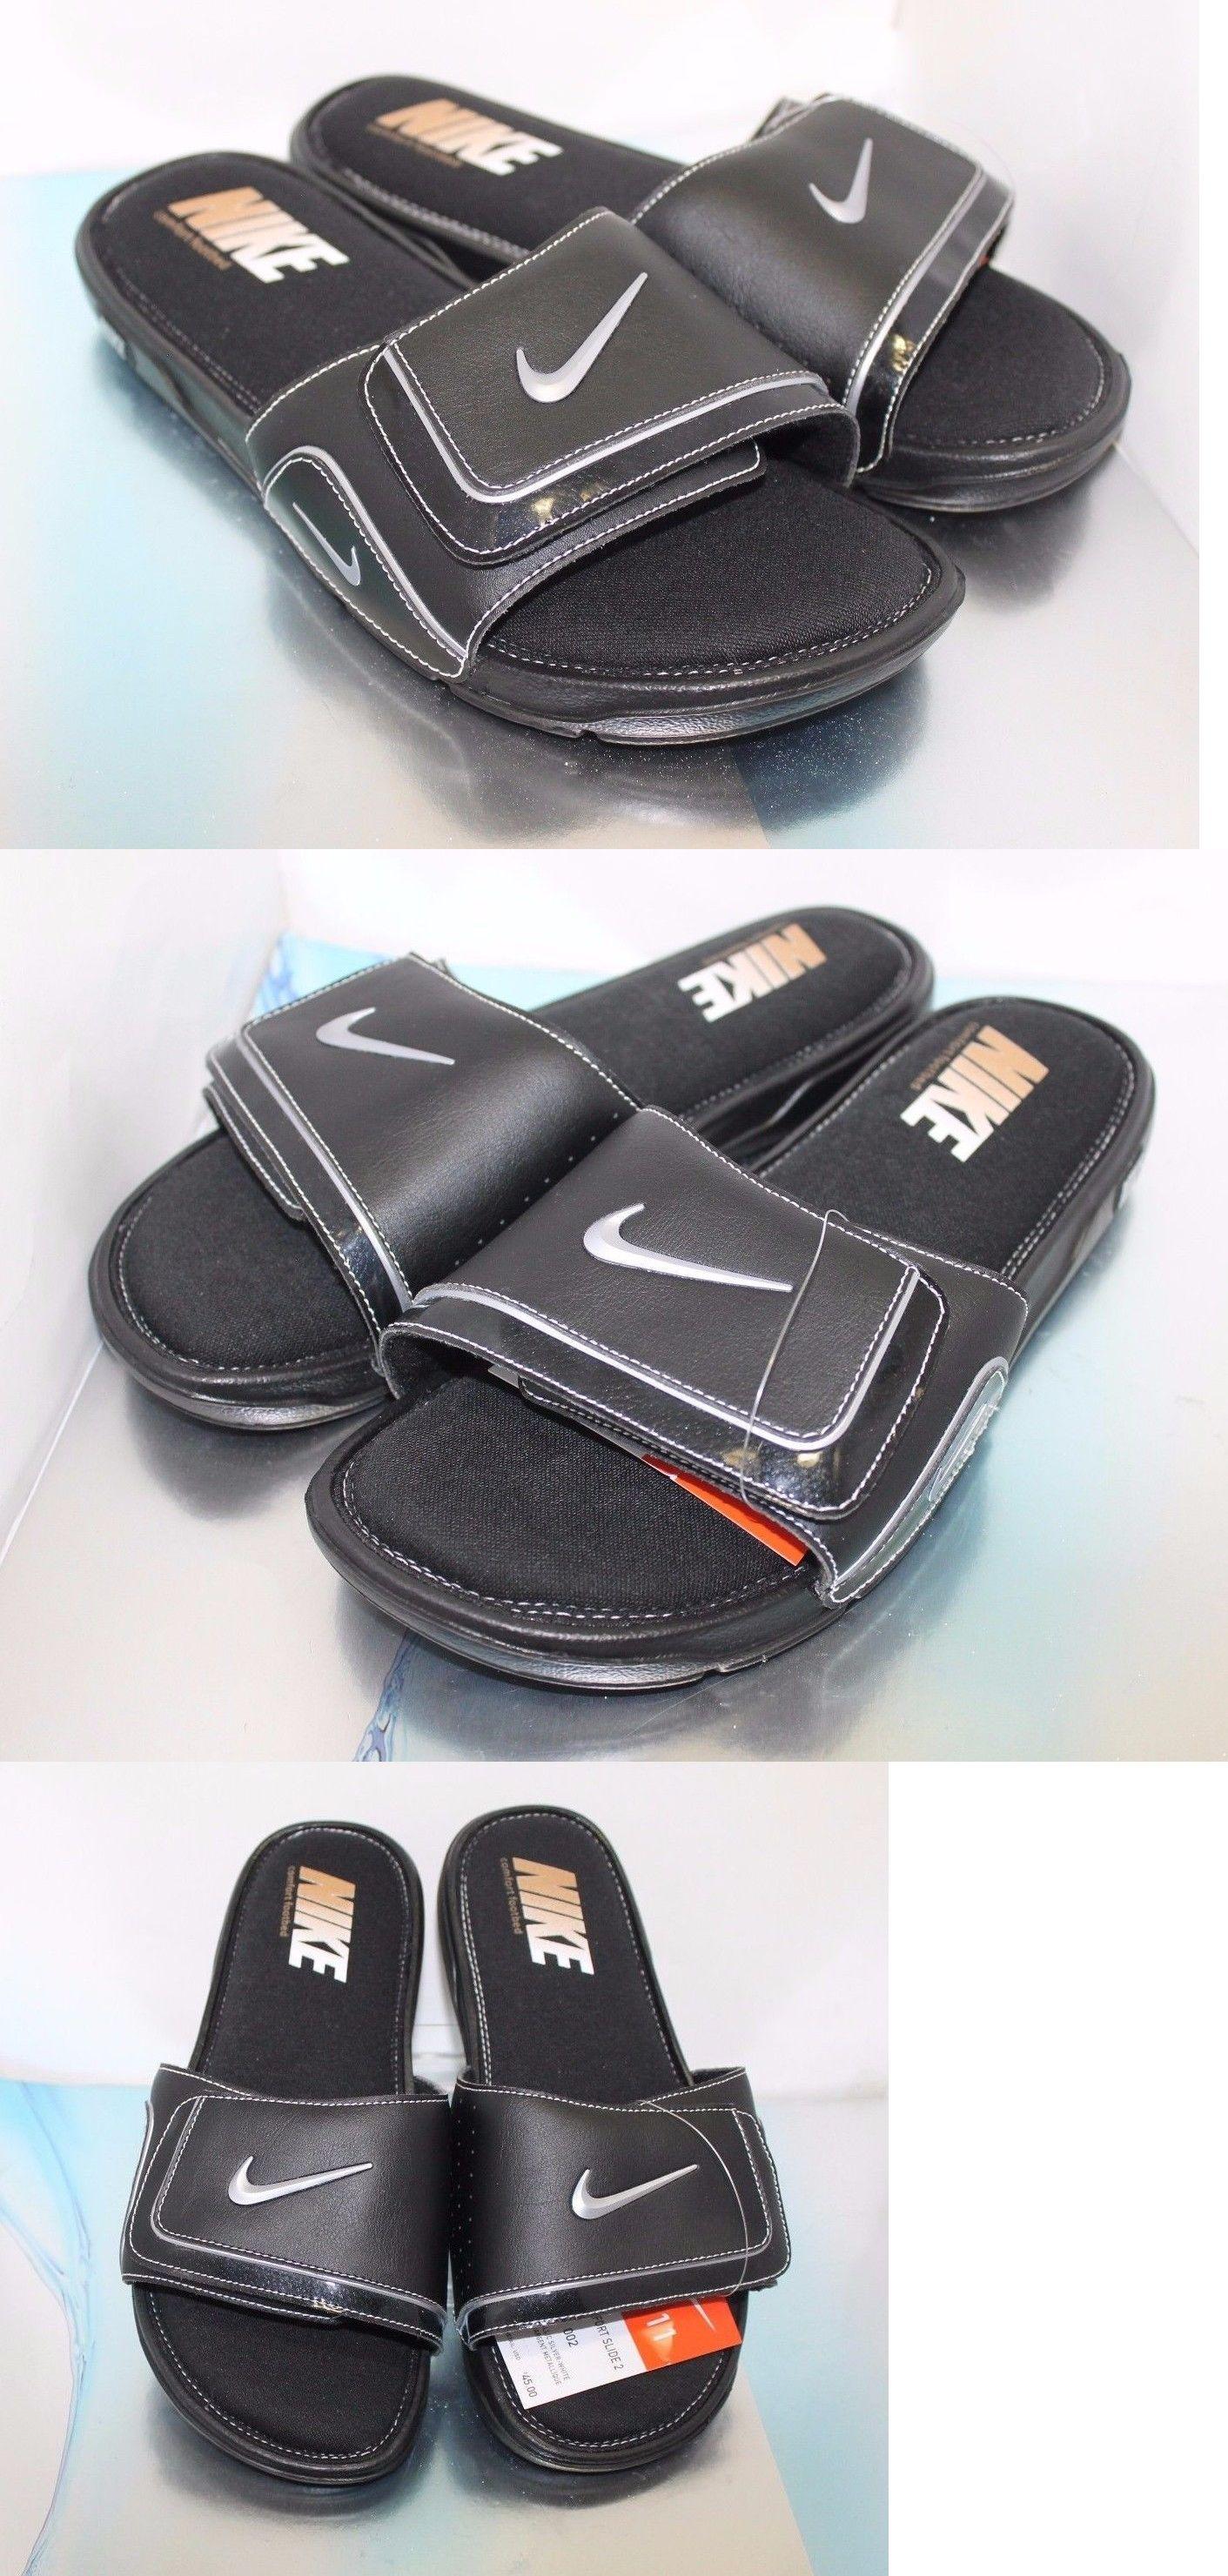 70052b7383565 Sandals and Flip Flops 11504  Men S Nike Comfort Slide 2 - Size 11 Us -   BUY IT NOW ONLY   49.49 on eBay!